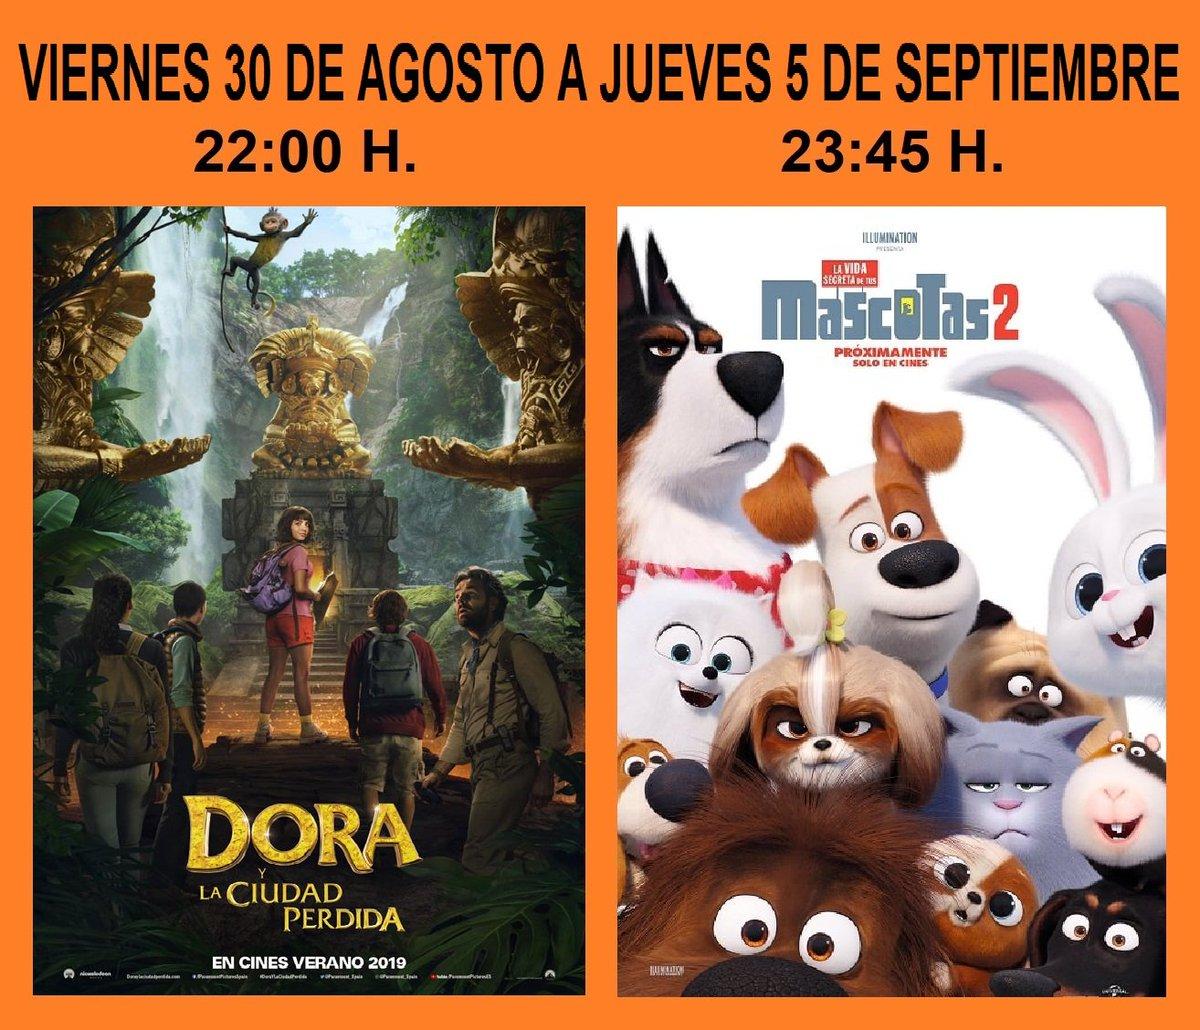 Terraza Lumiere On Twitter Cartelera Hoy Ultimo Día 22 00